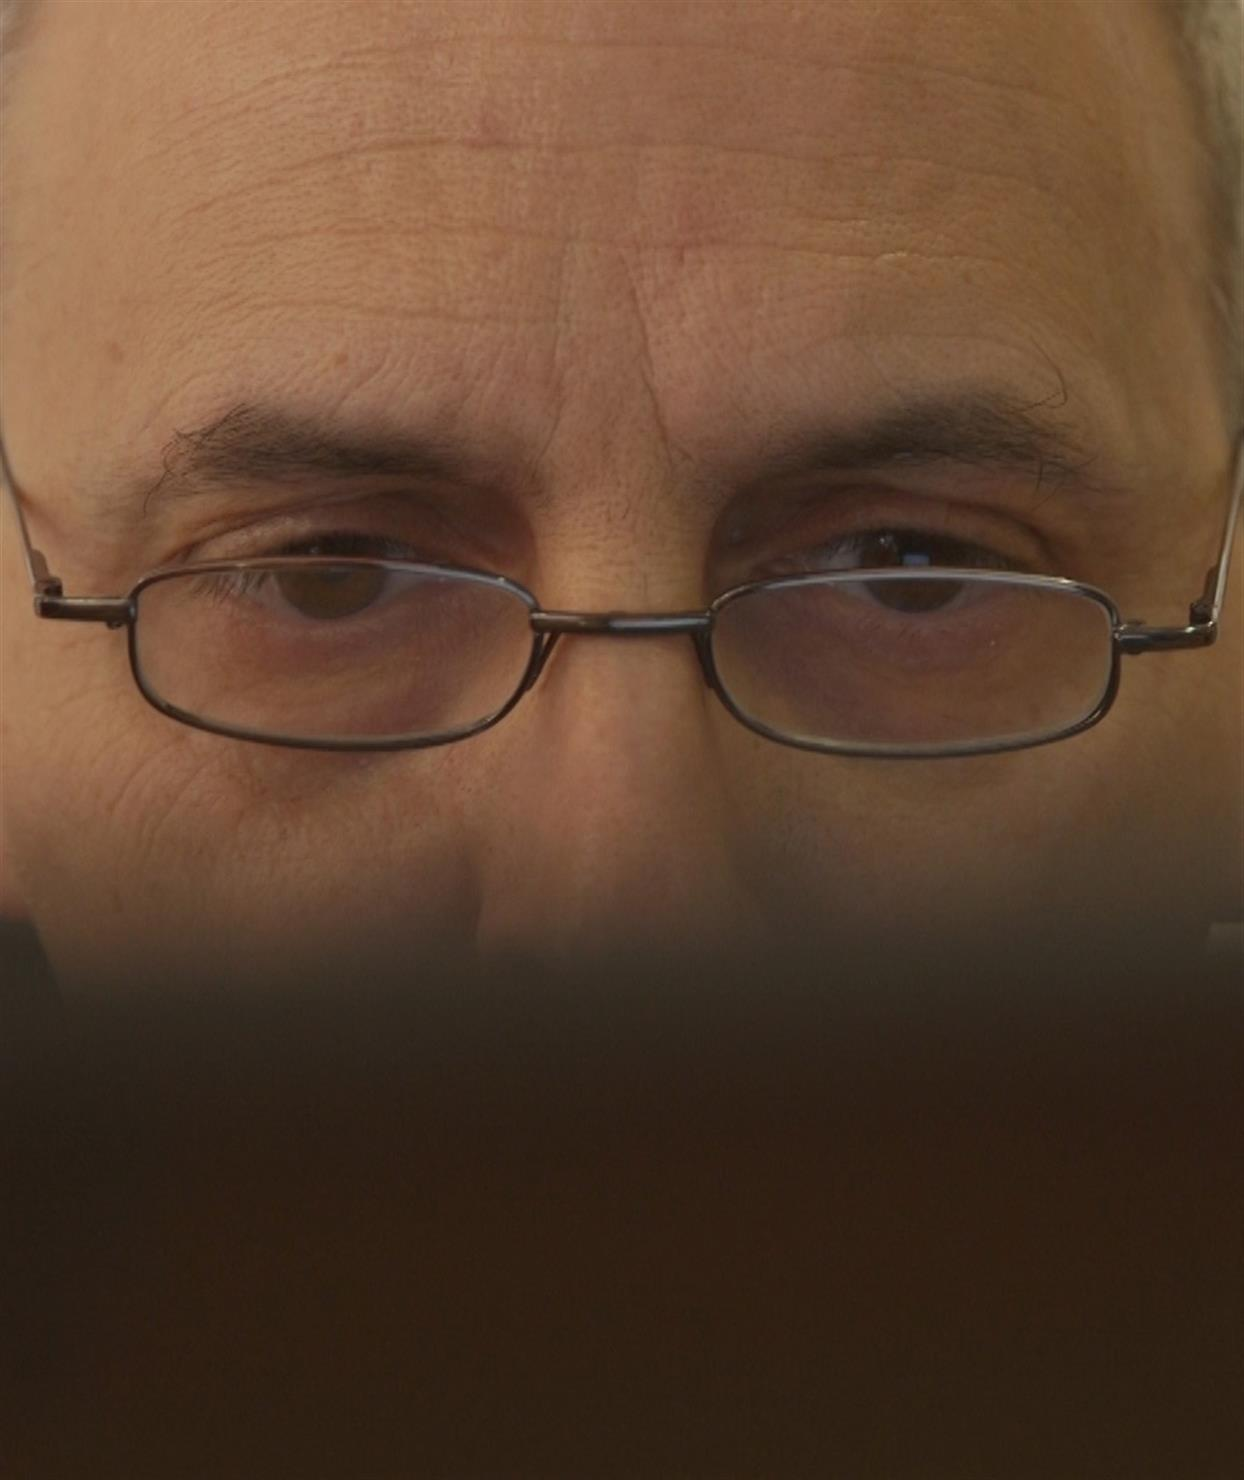 VICE SPECIALS - Ο ΣΙΩΠΗΡΟΣ ΠΟΛΕΜΟΣ ΚΑΙ ΟΙ ΕΛΛΗΝΕΣ ΧΑΚΕΡ